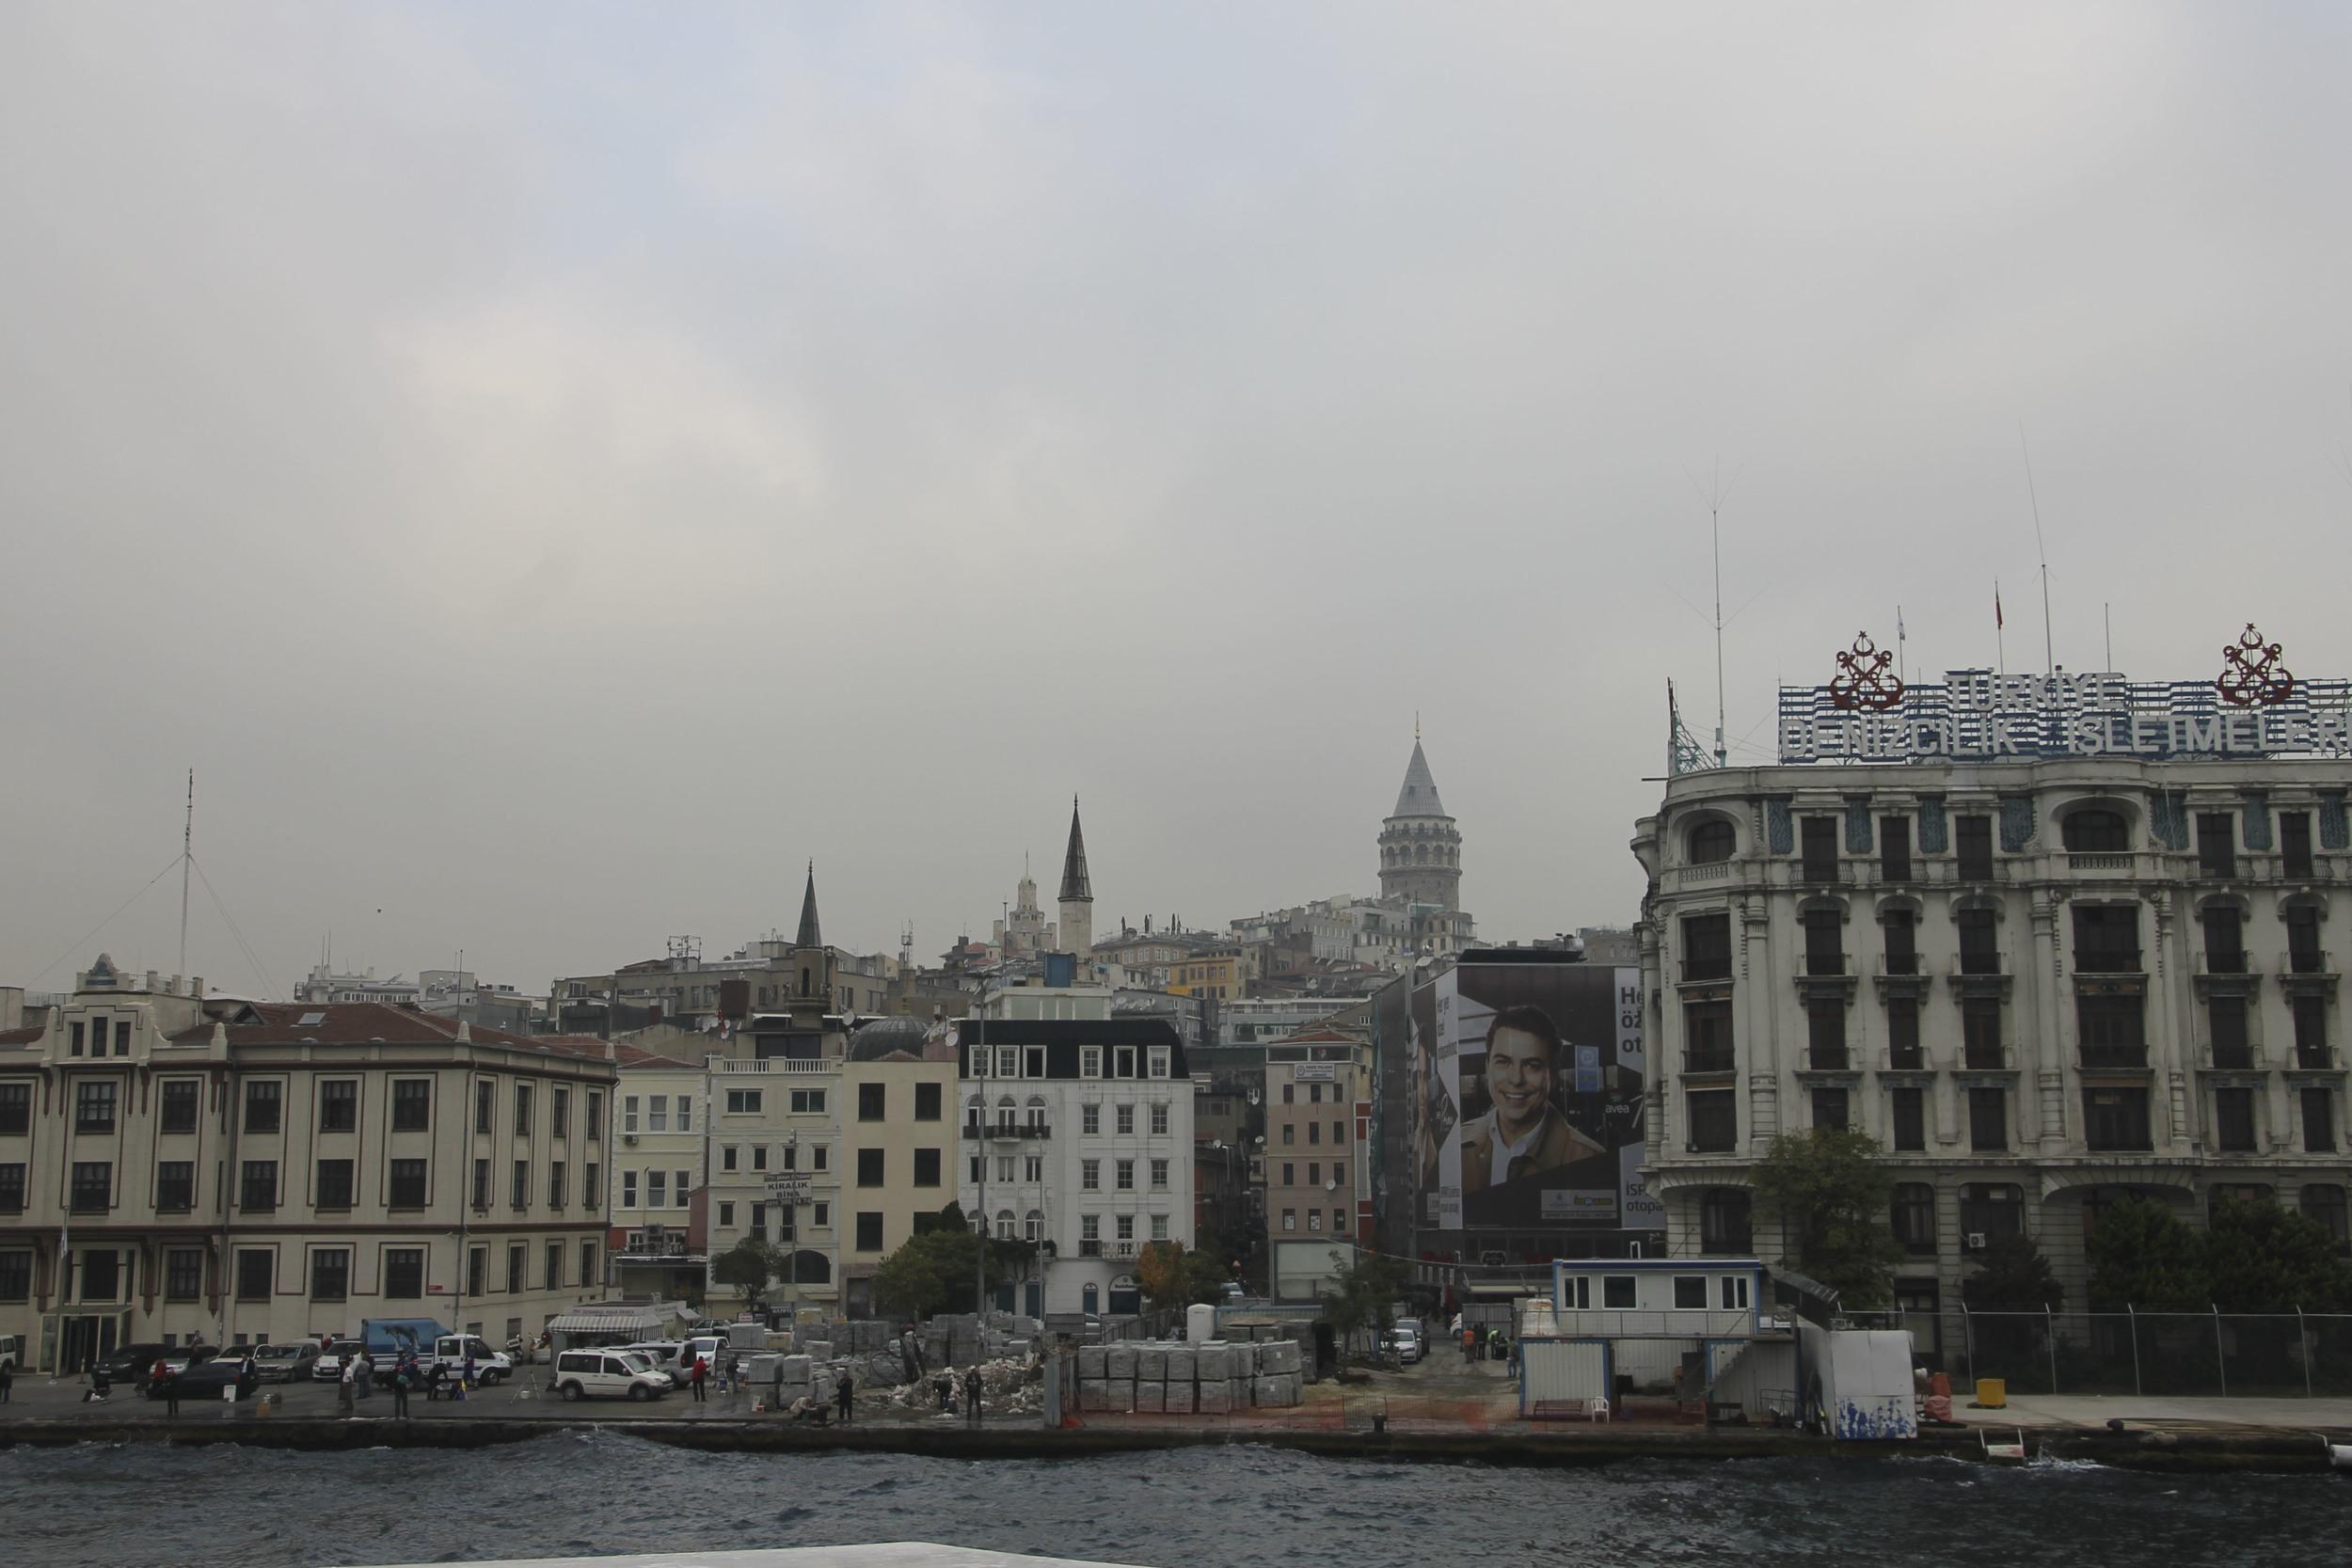 Istanbul, ygatonic on tour, Turkey yoga in istanbul2221.jpg